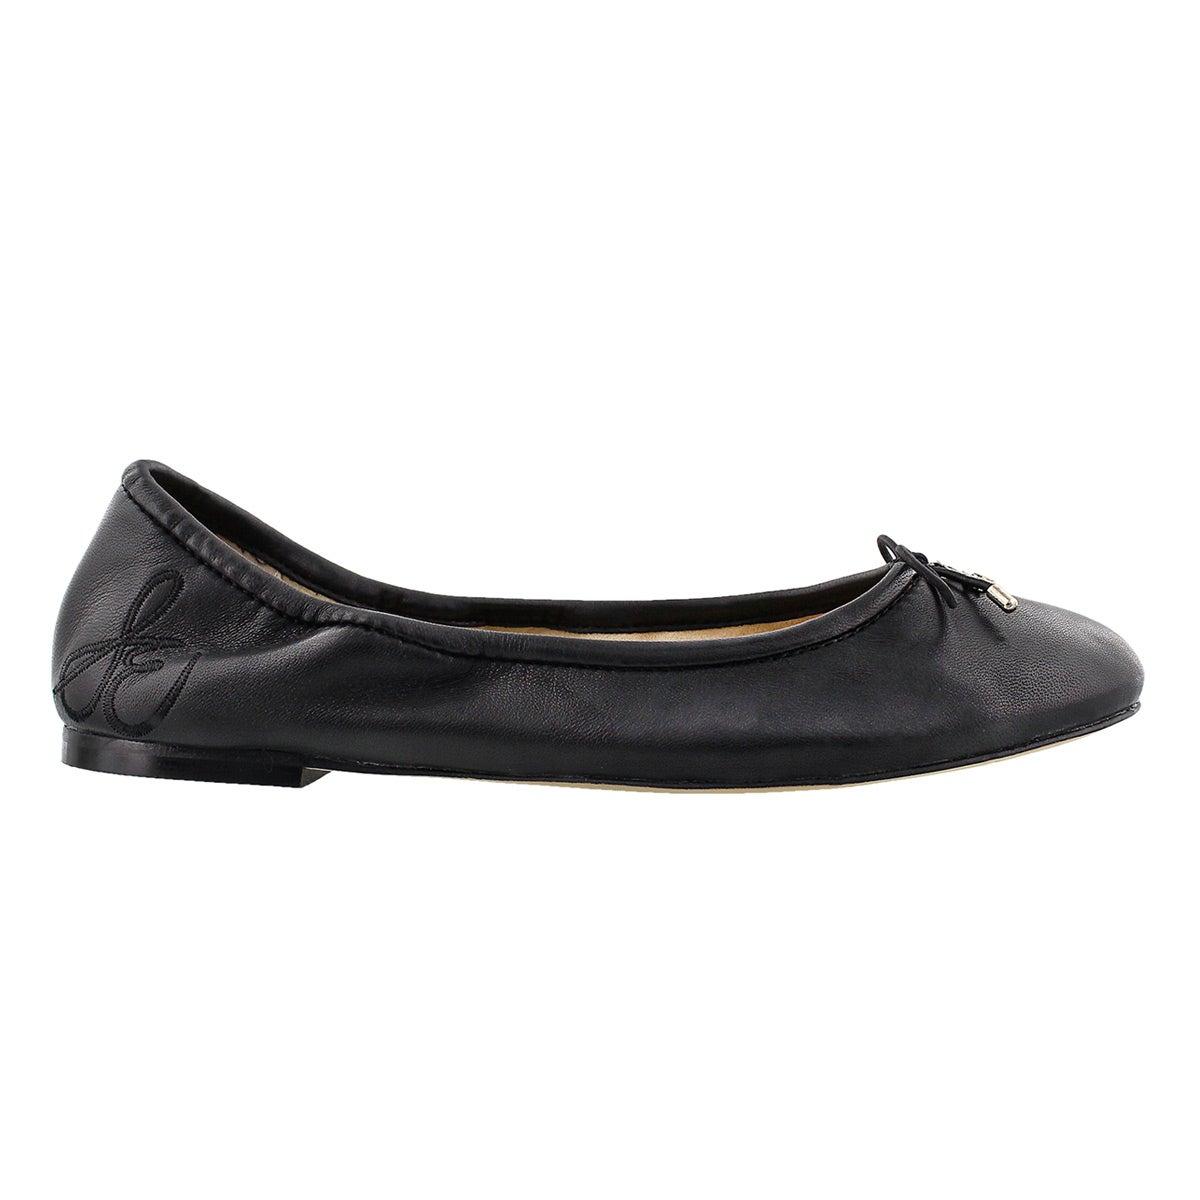 Lds Felicia black ballerina dress flat